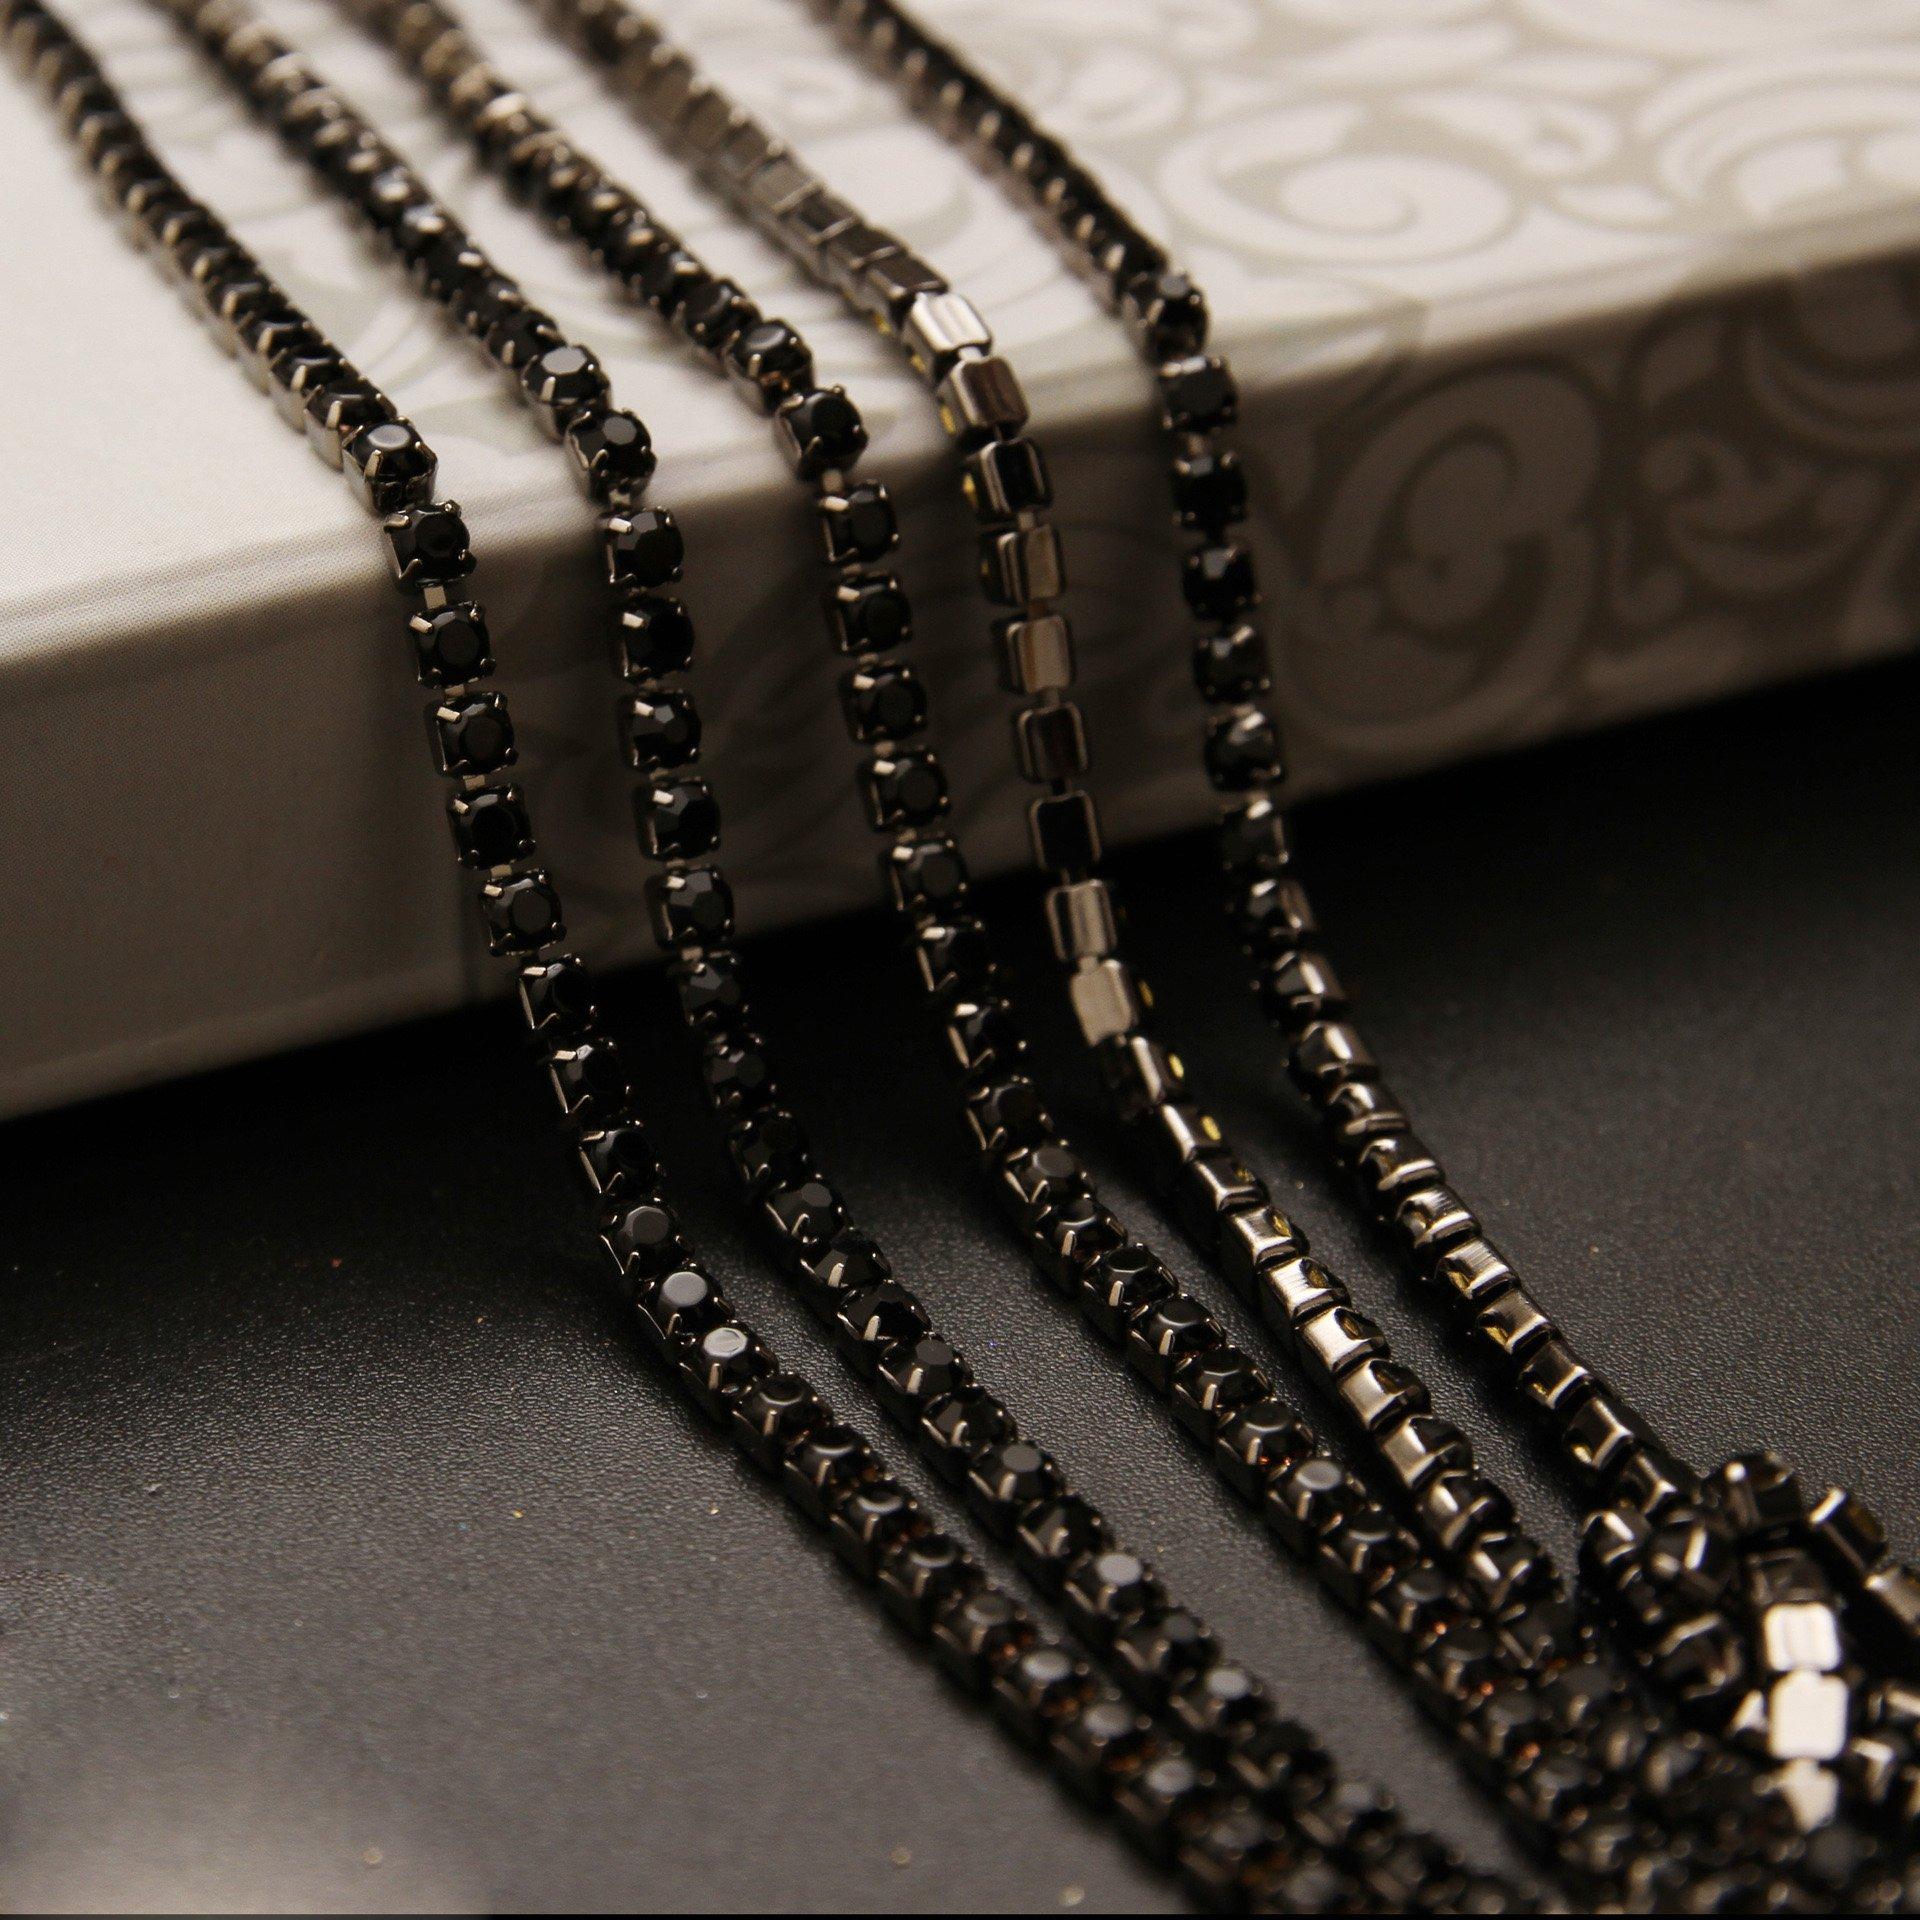 Silver Chain with Aquamarine Crystal Beads SS16//4.0mm KAOYOO 1 Roll 10 Yards Crystal Rhinestone Close Chain Trim